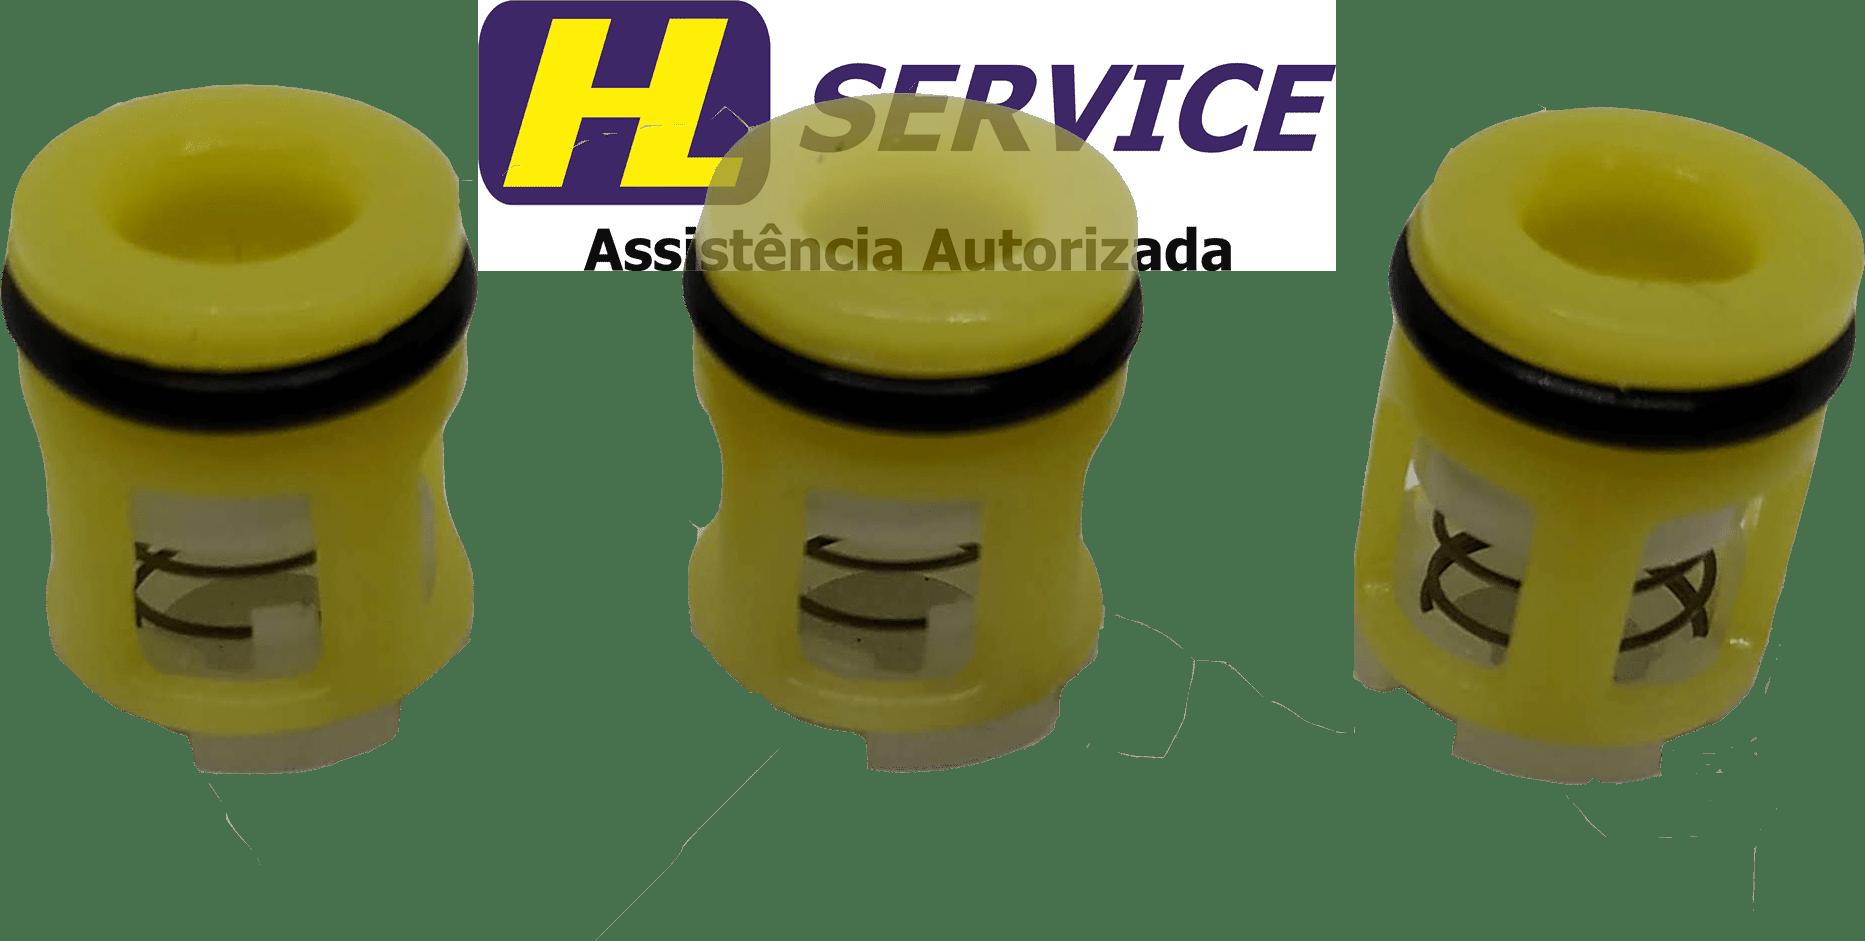 Válvula De Pressão Lava Jato Electrolux Pws20 - Frete Grátis  - HL SERVICE